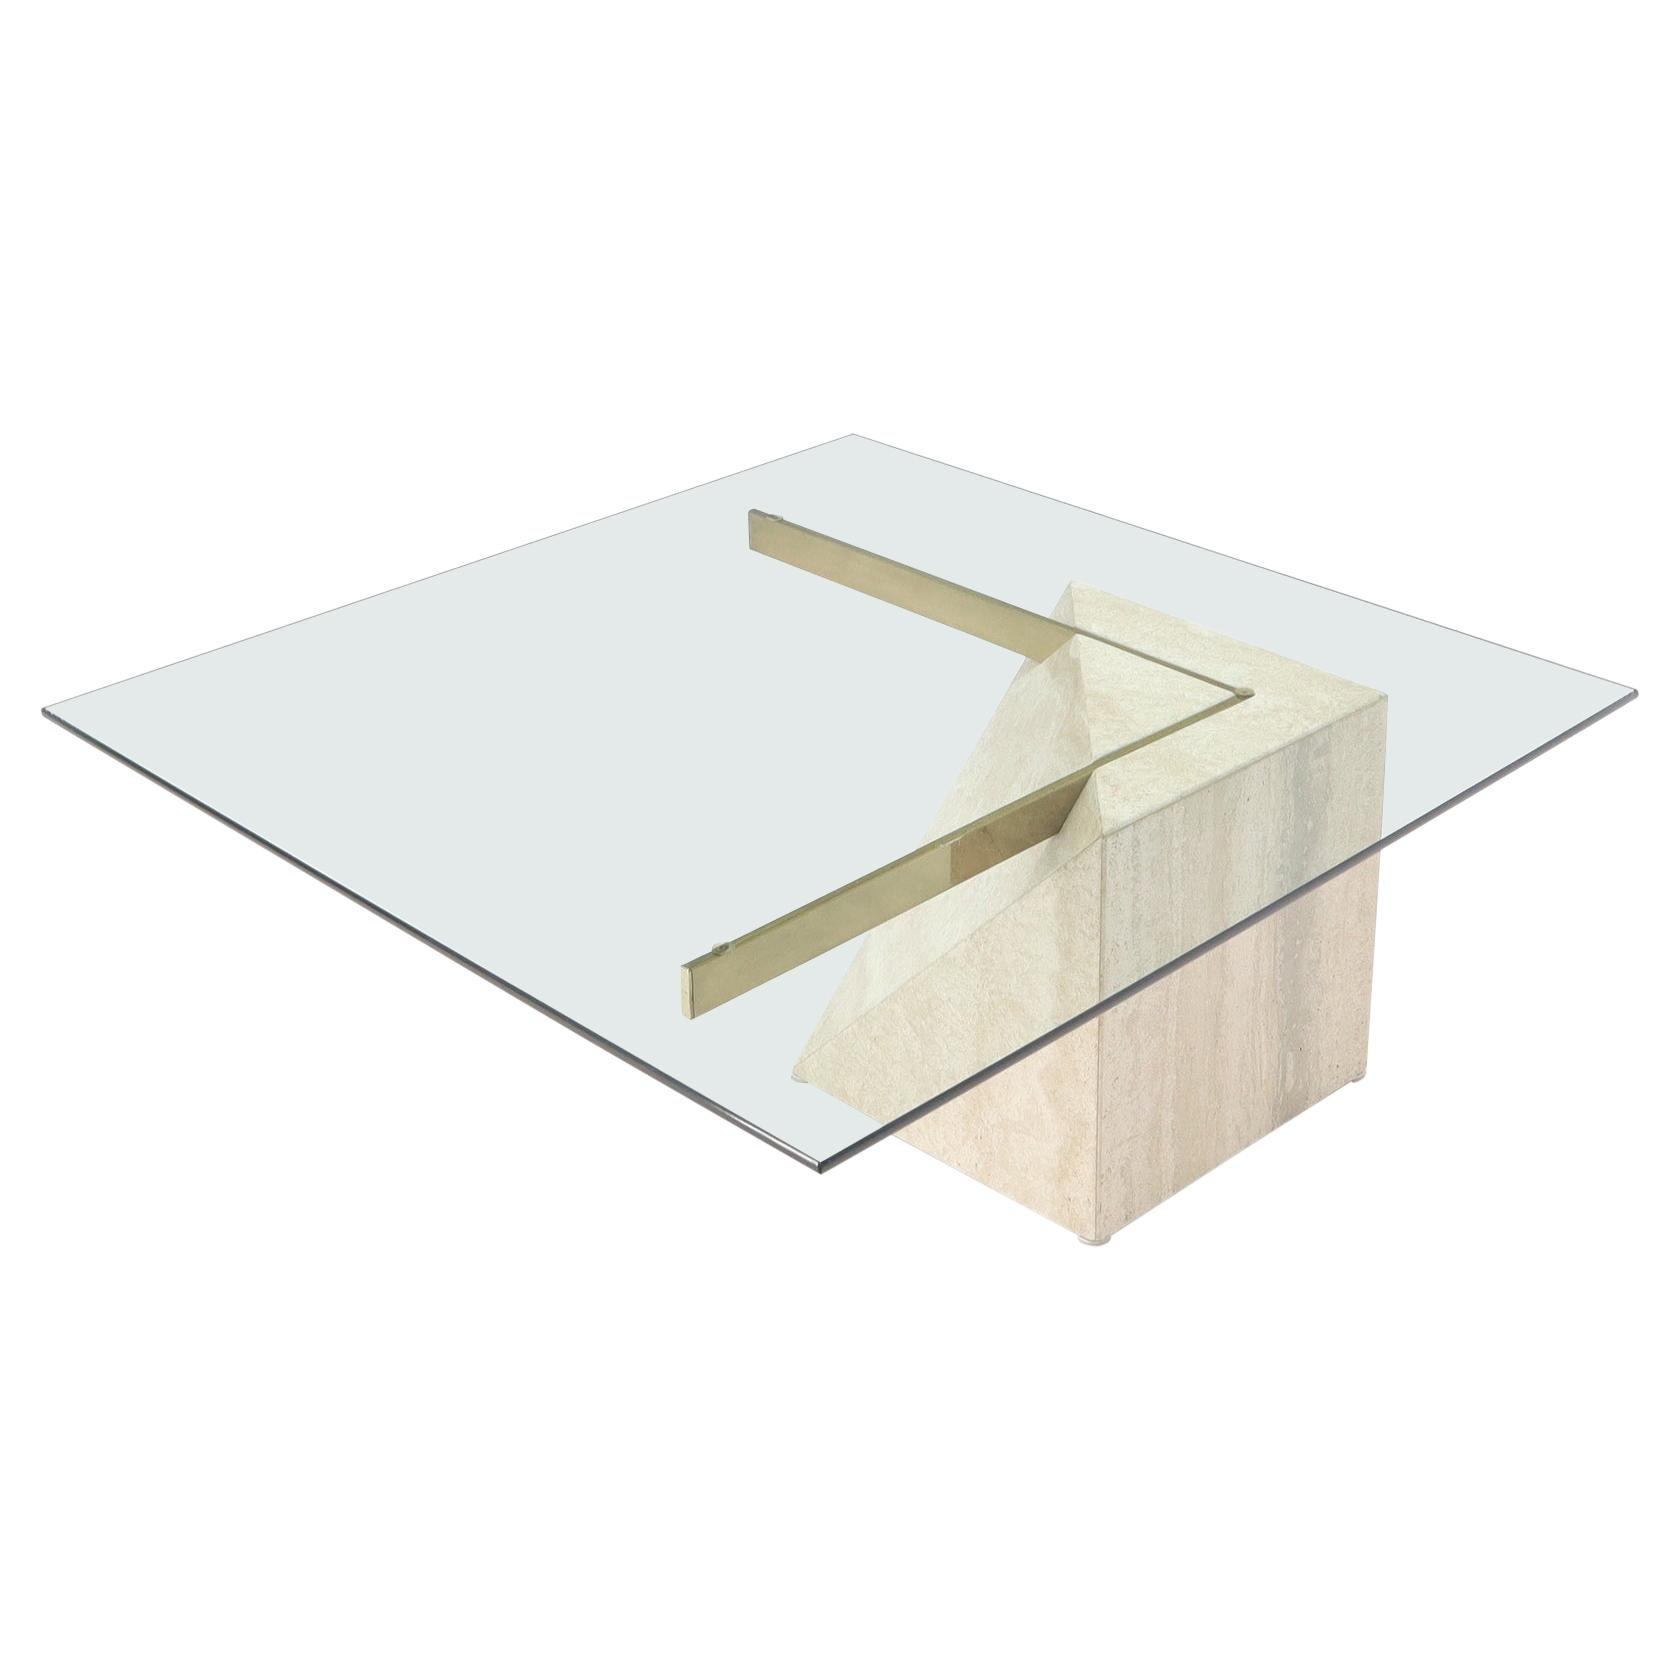 Glass Travertine & Brass Italian Mid-Century Modern Square coffee Table Artedi